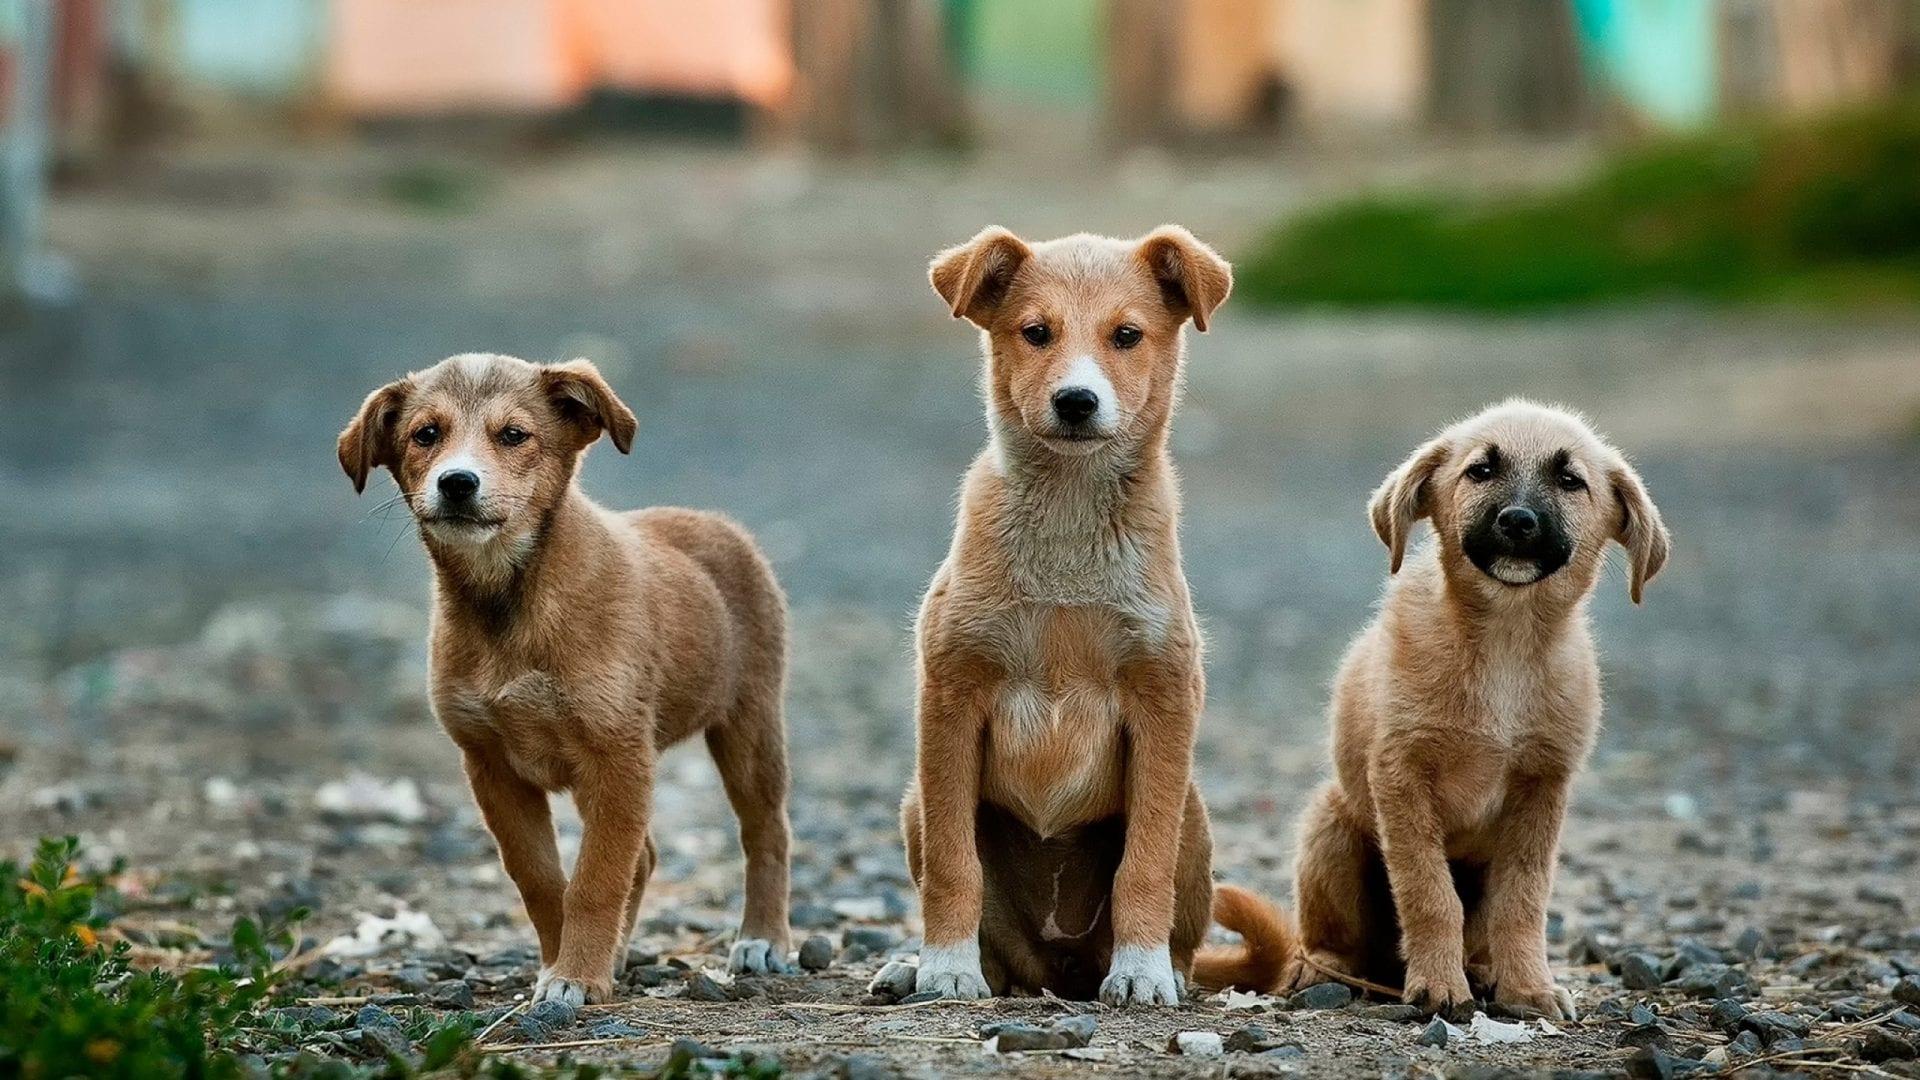 Dropshipping Dog Chews: Organic Pet Chews Opportunities